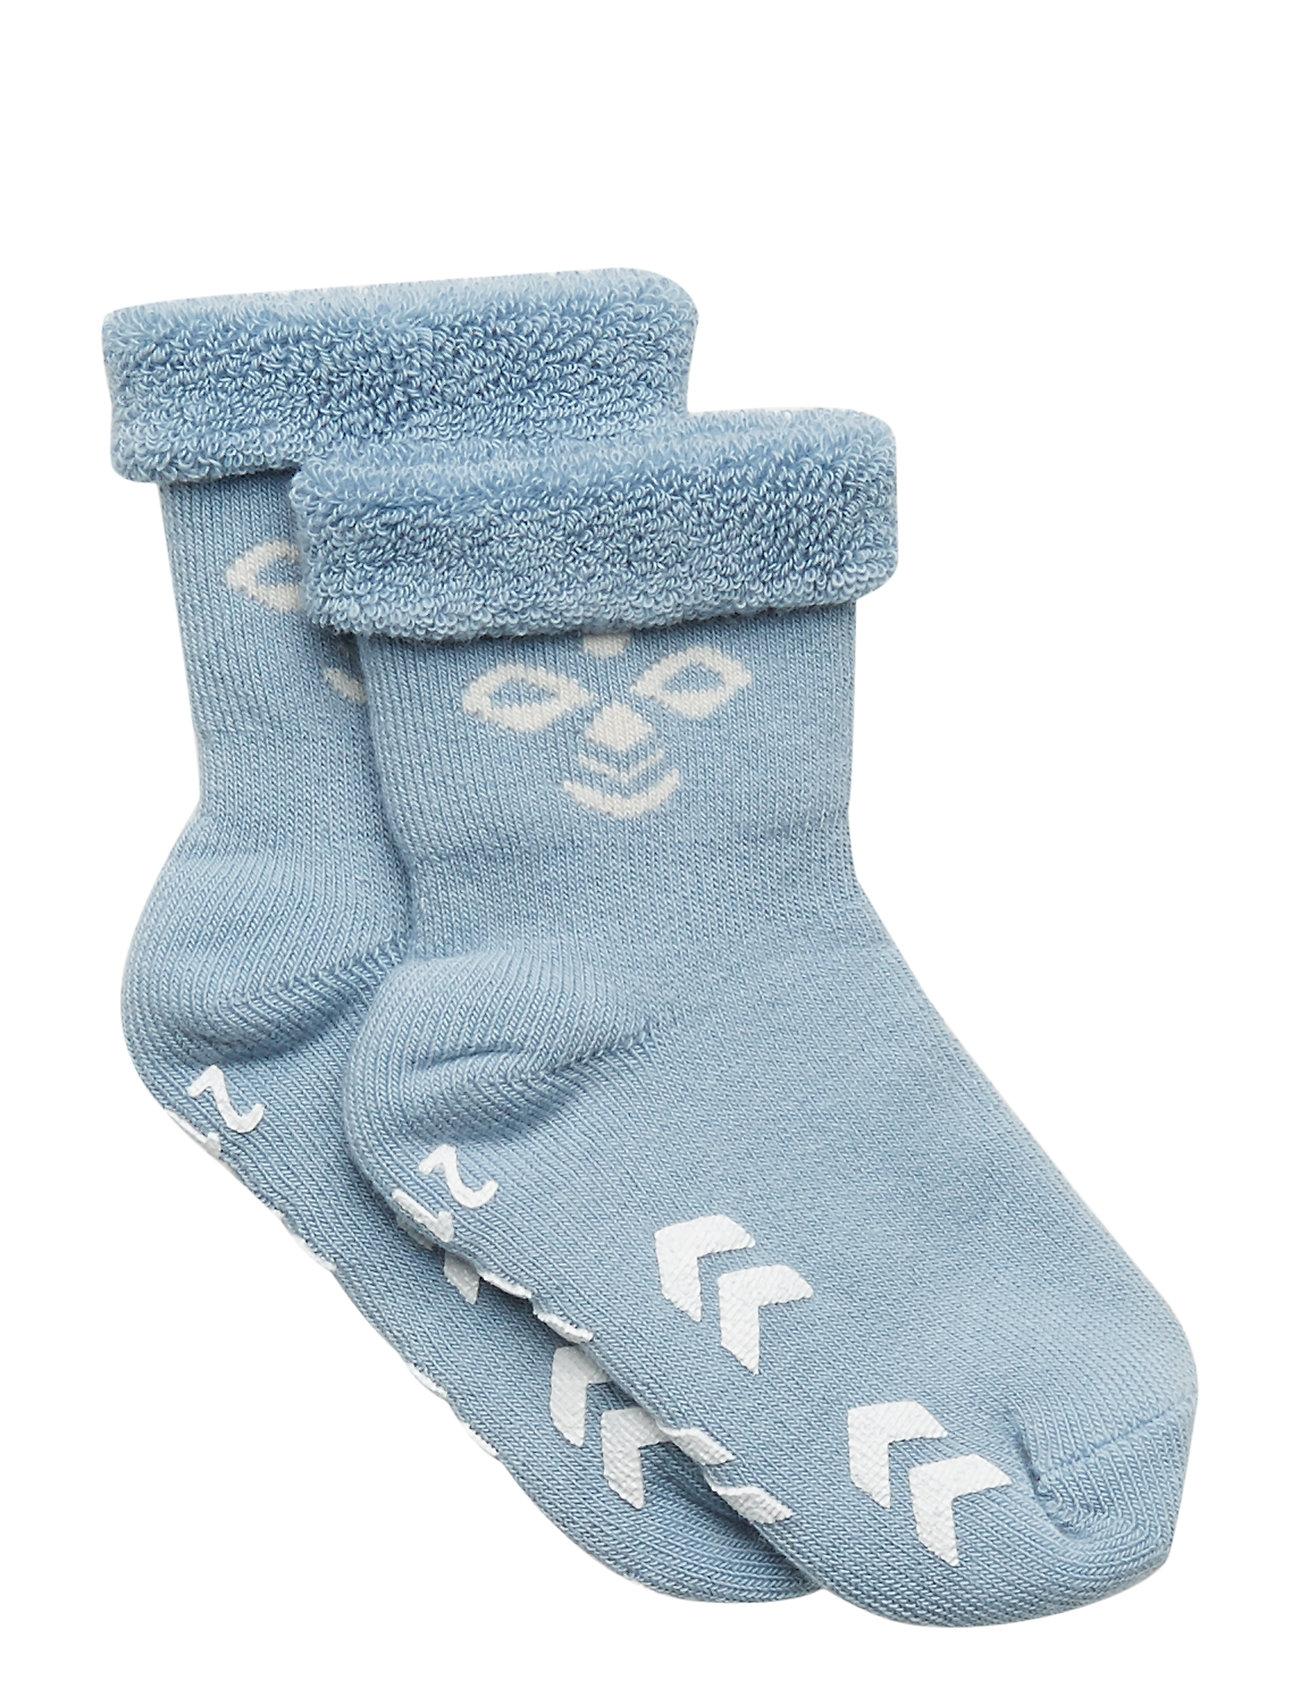 Hummel SNUBBIE SOCKS - ASHLEY BLUE